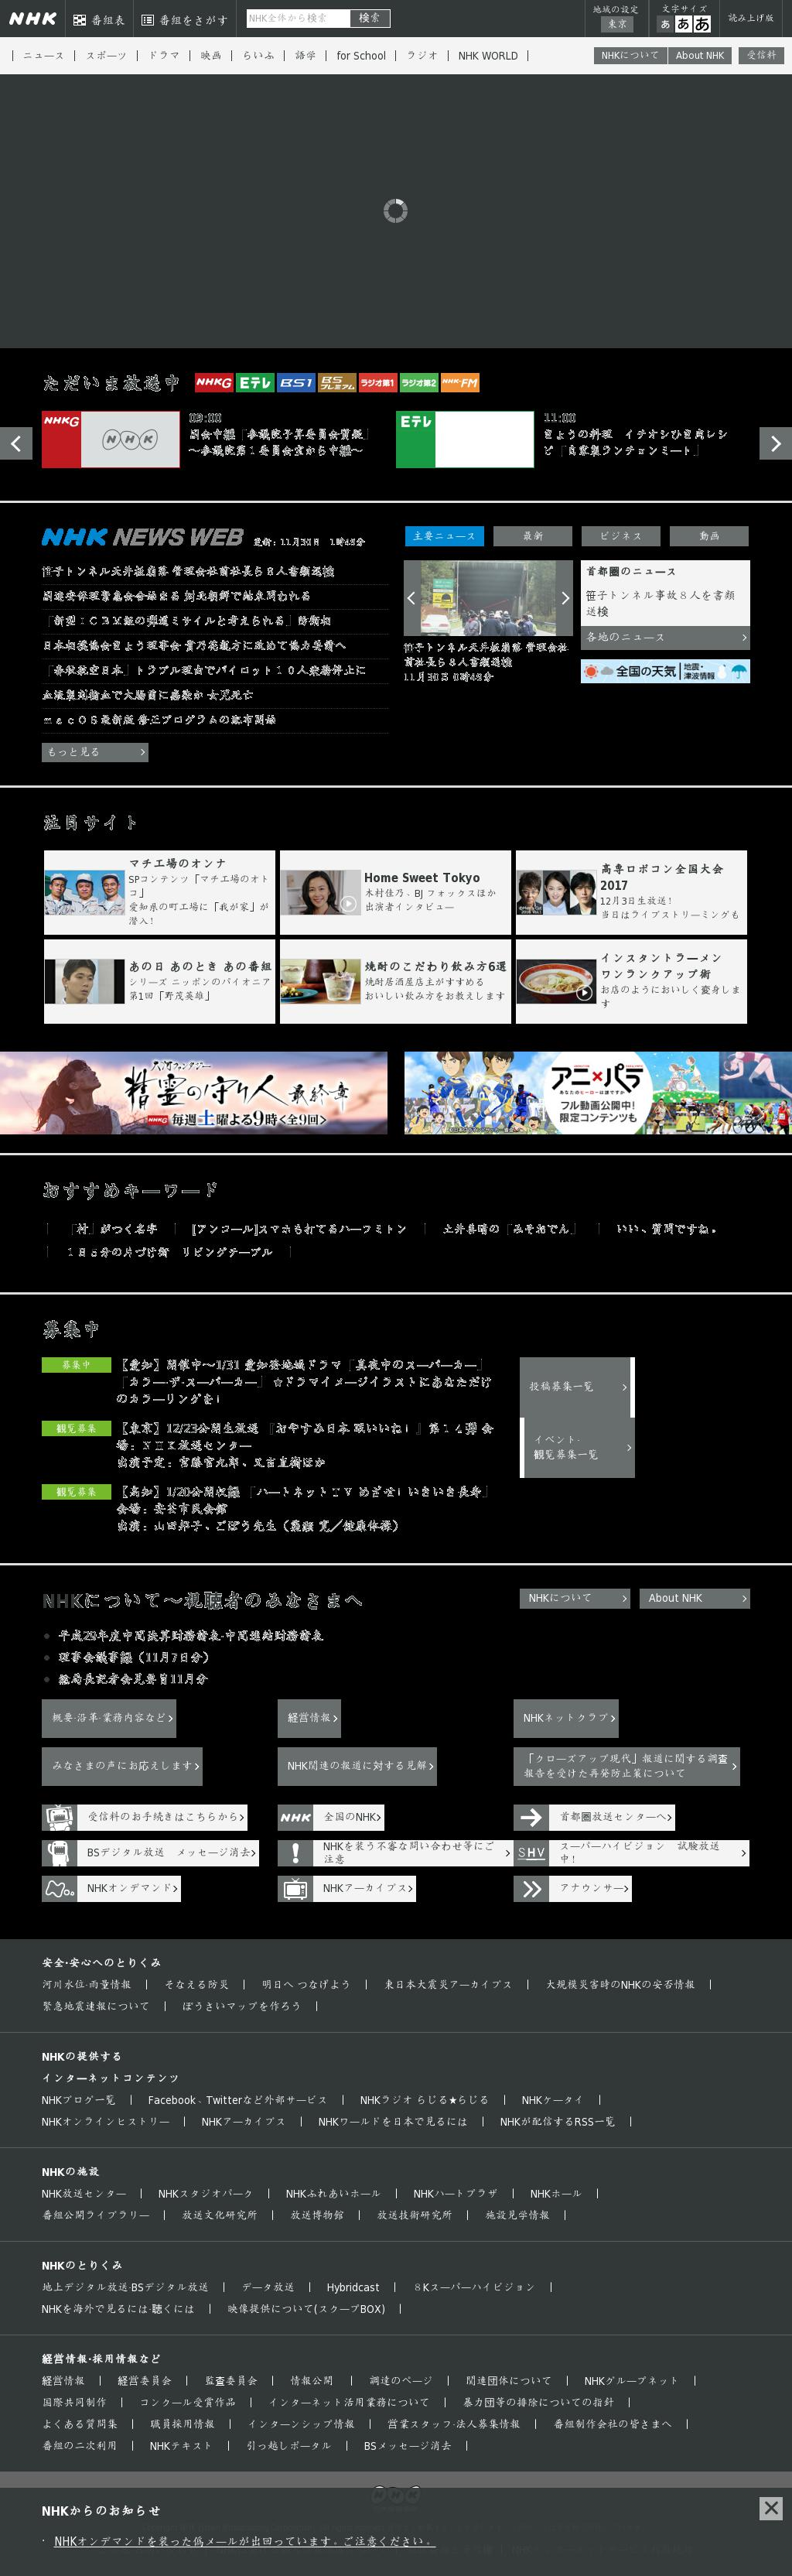 NHK Online at Thursday March 15, 2018, 8:07 a.m. UTC